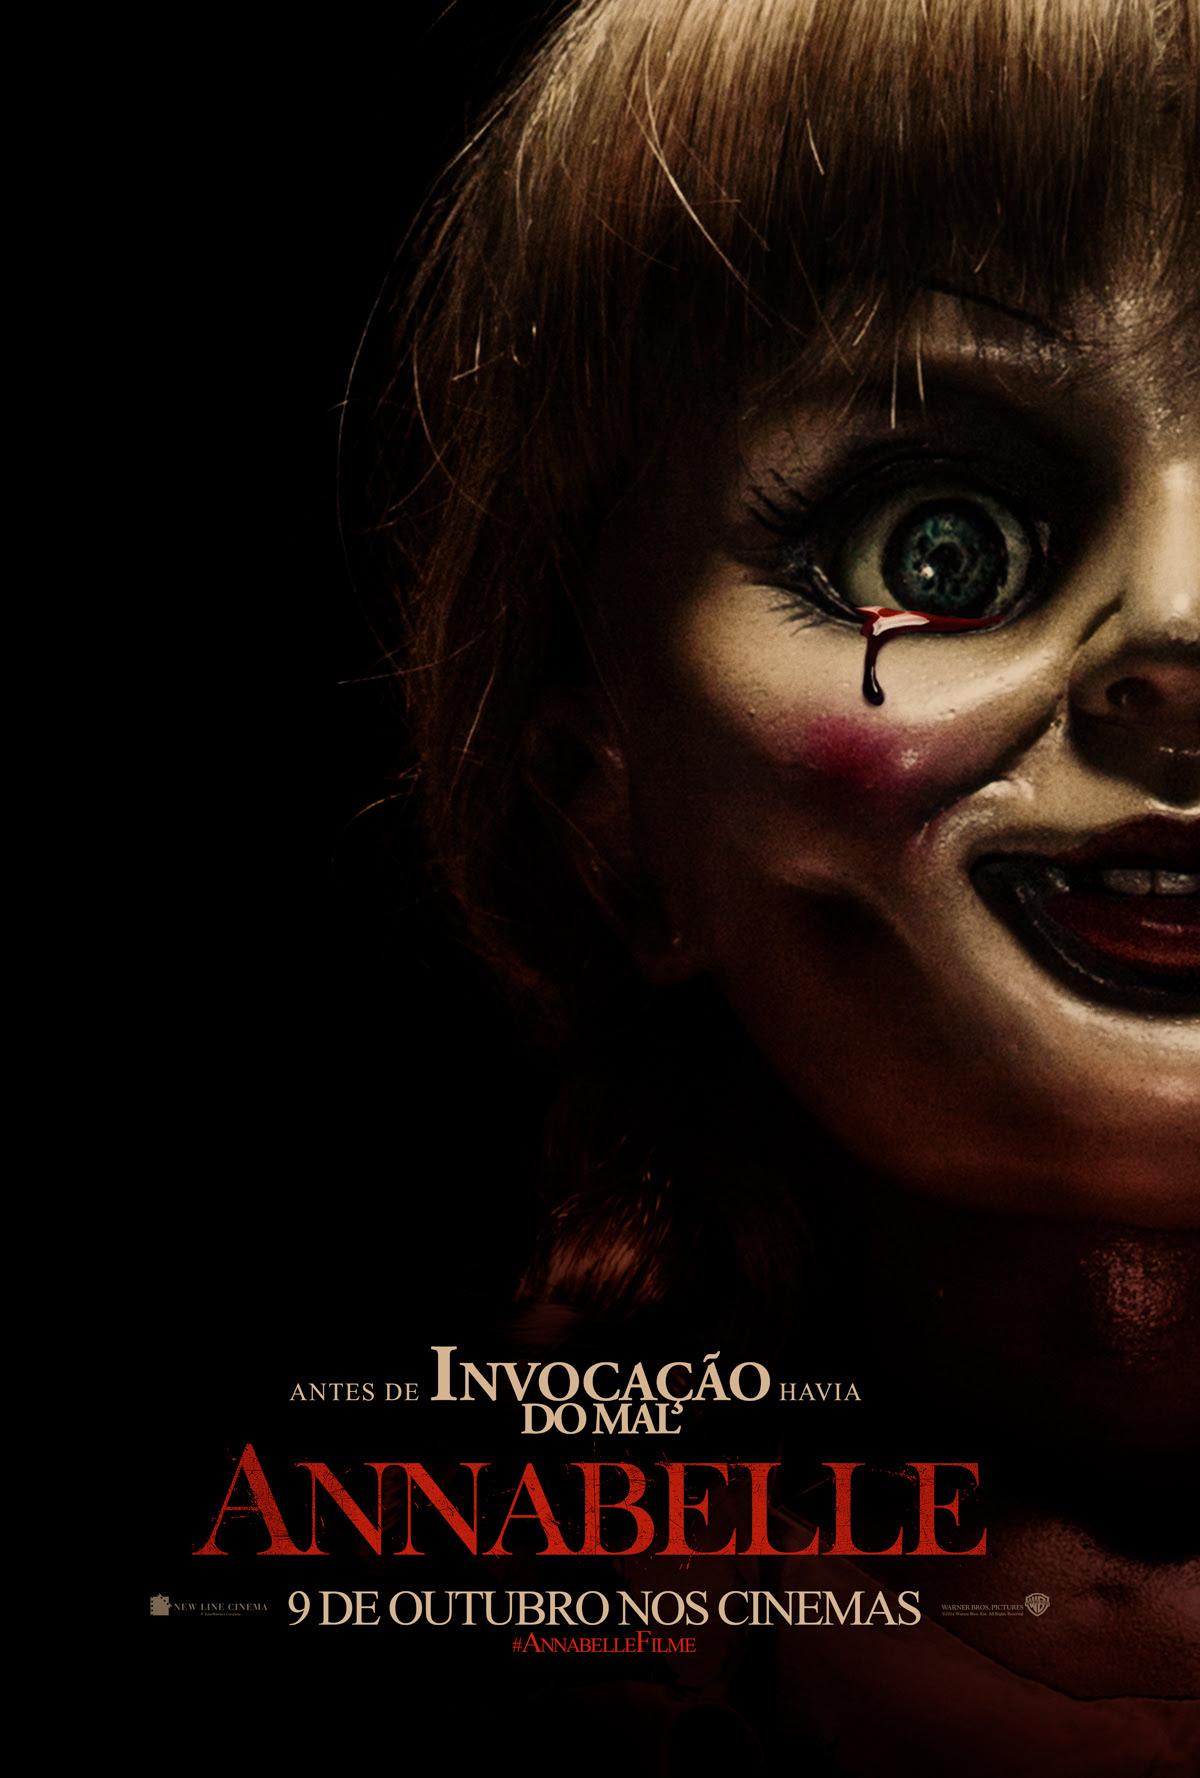 O Filme da Semana - Annabelle.